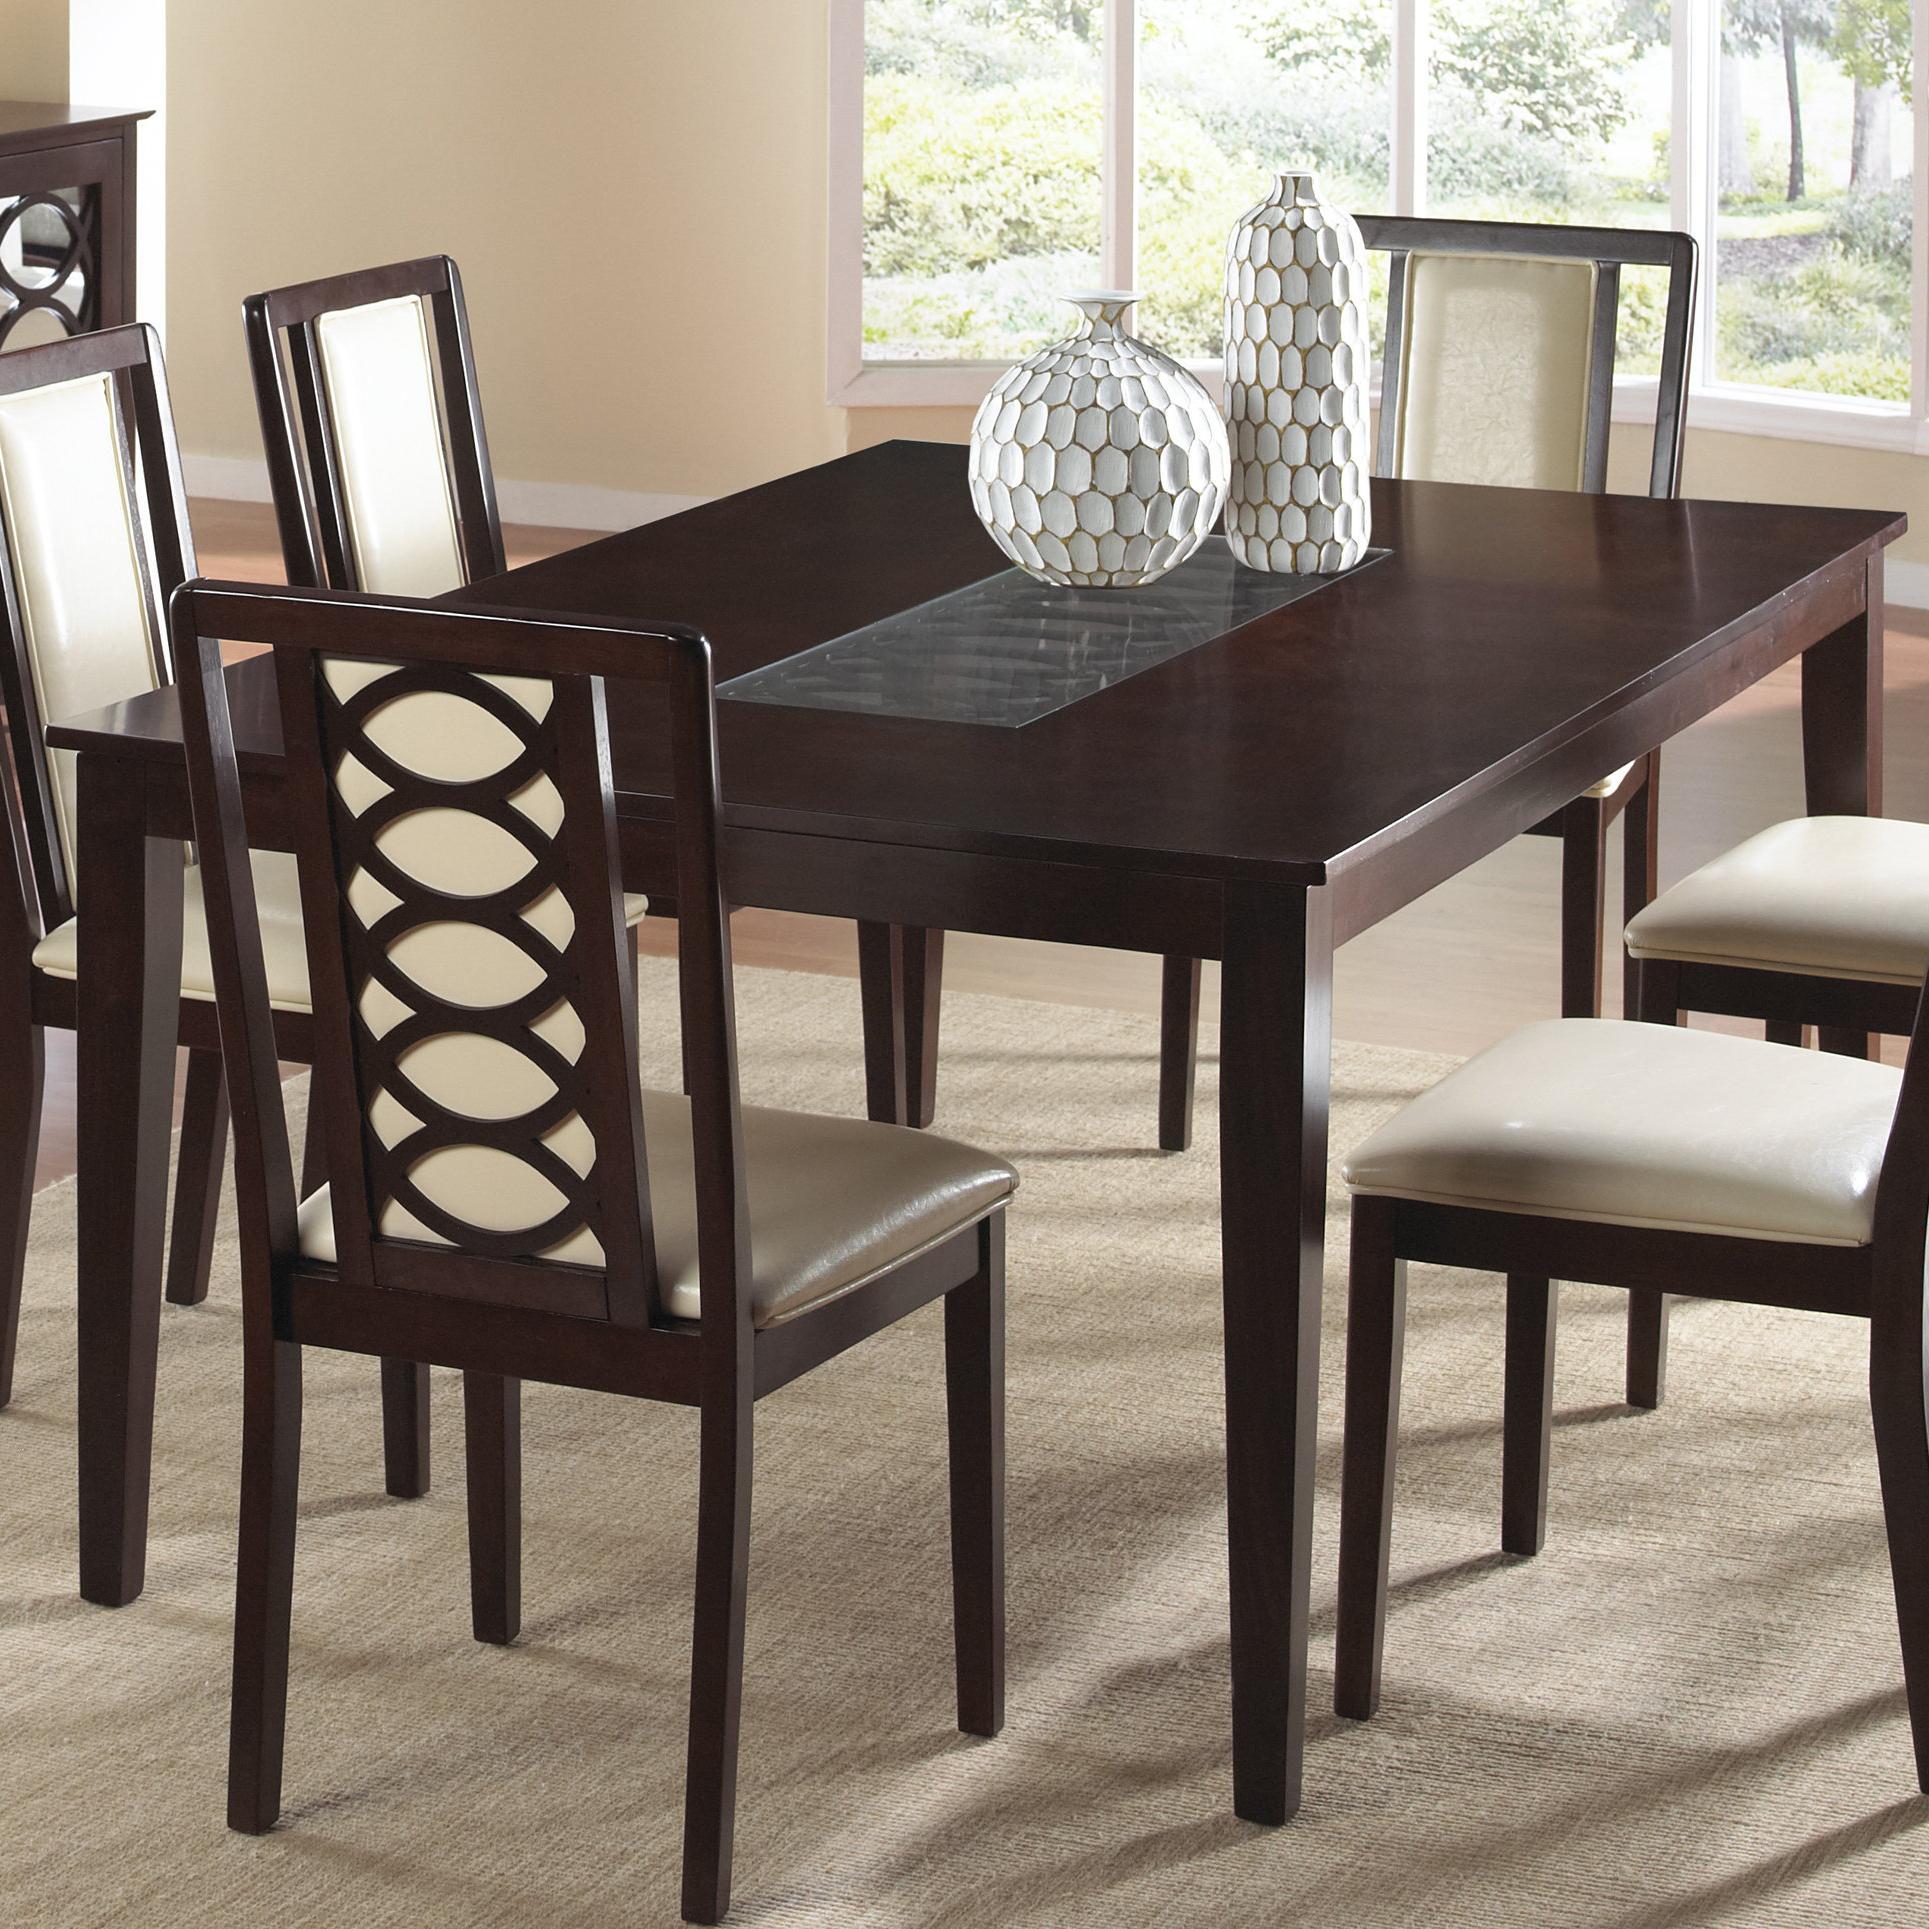 Cramco, Inc Jasmyn Rectangular Wood Table   Value City ...